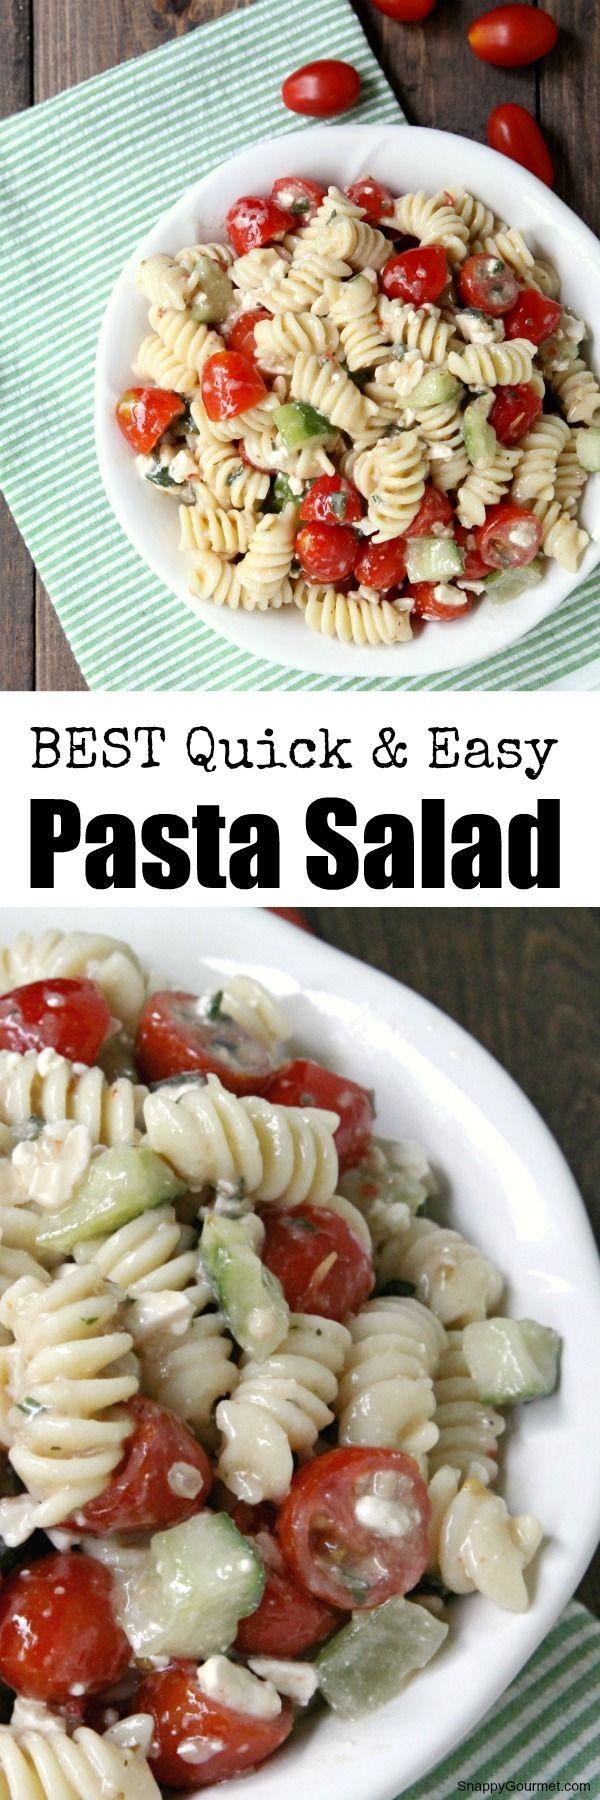 100 Cold Pasta Recipes On Pinterest Pasta Salad Recipes